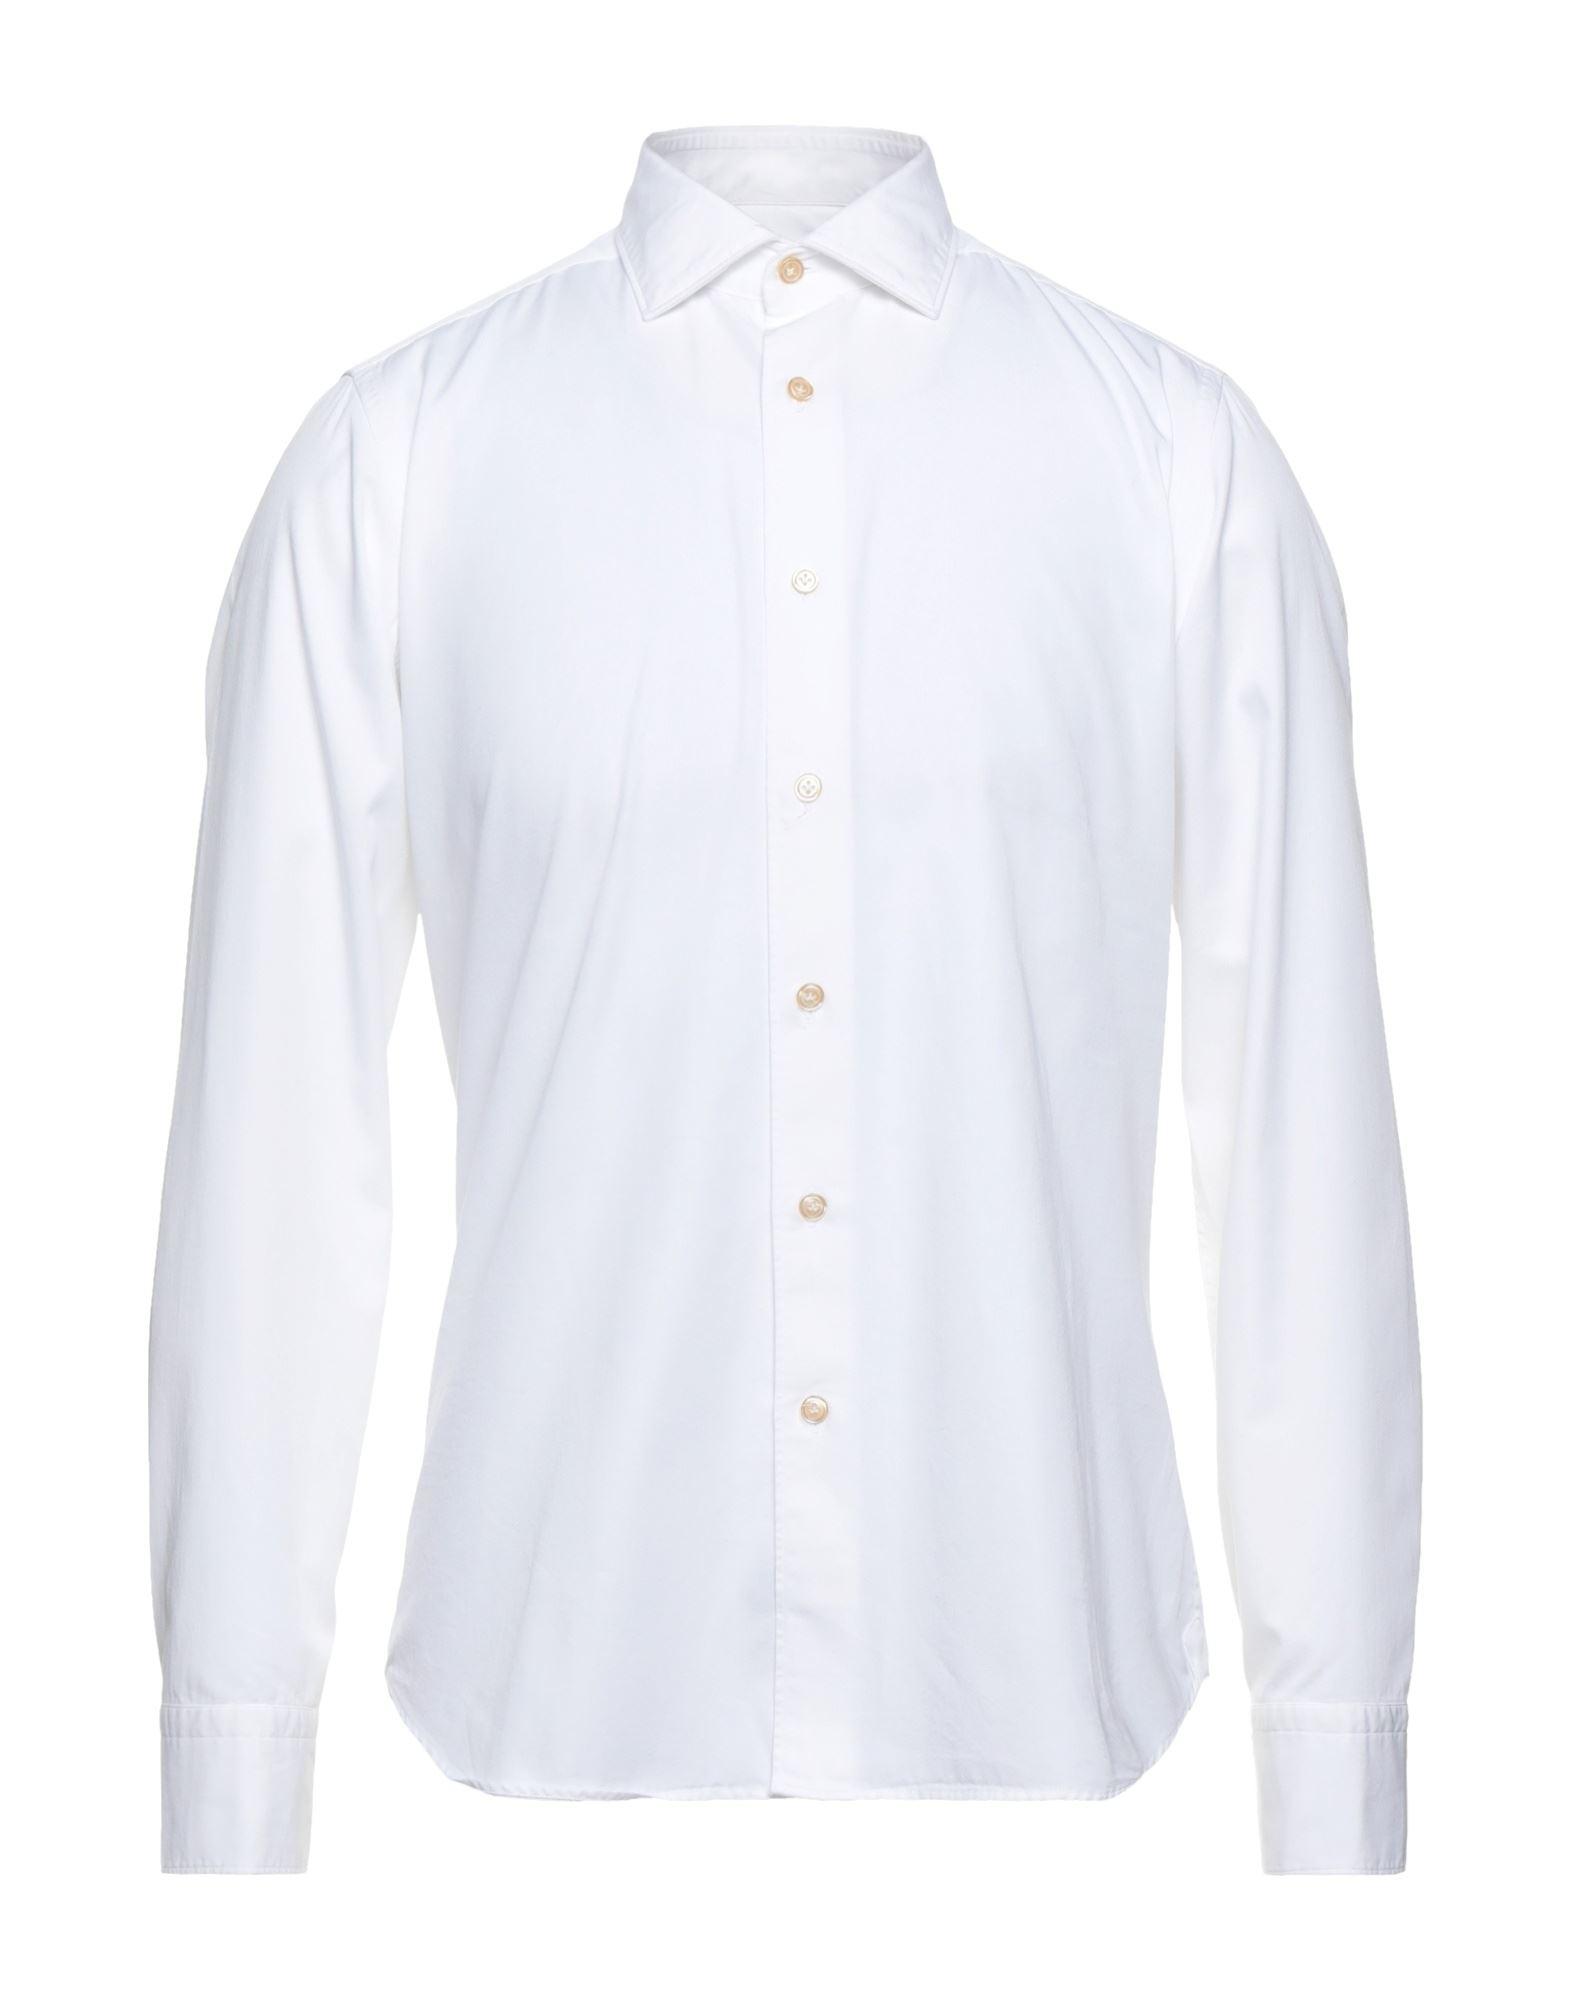 alex doriani pубашка ALEX DORIANI Pубашка